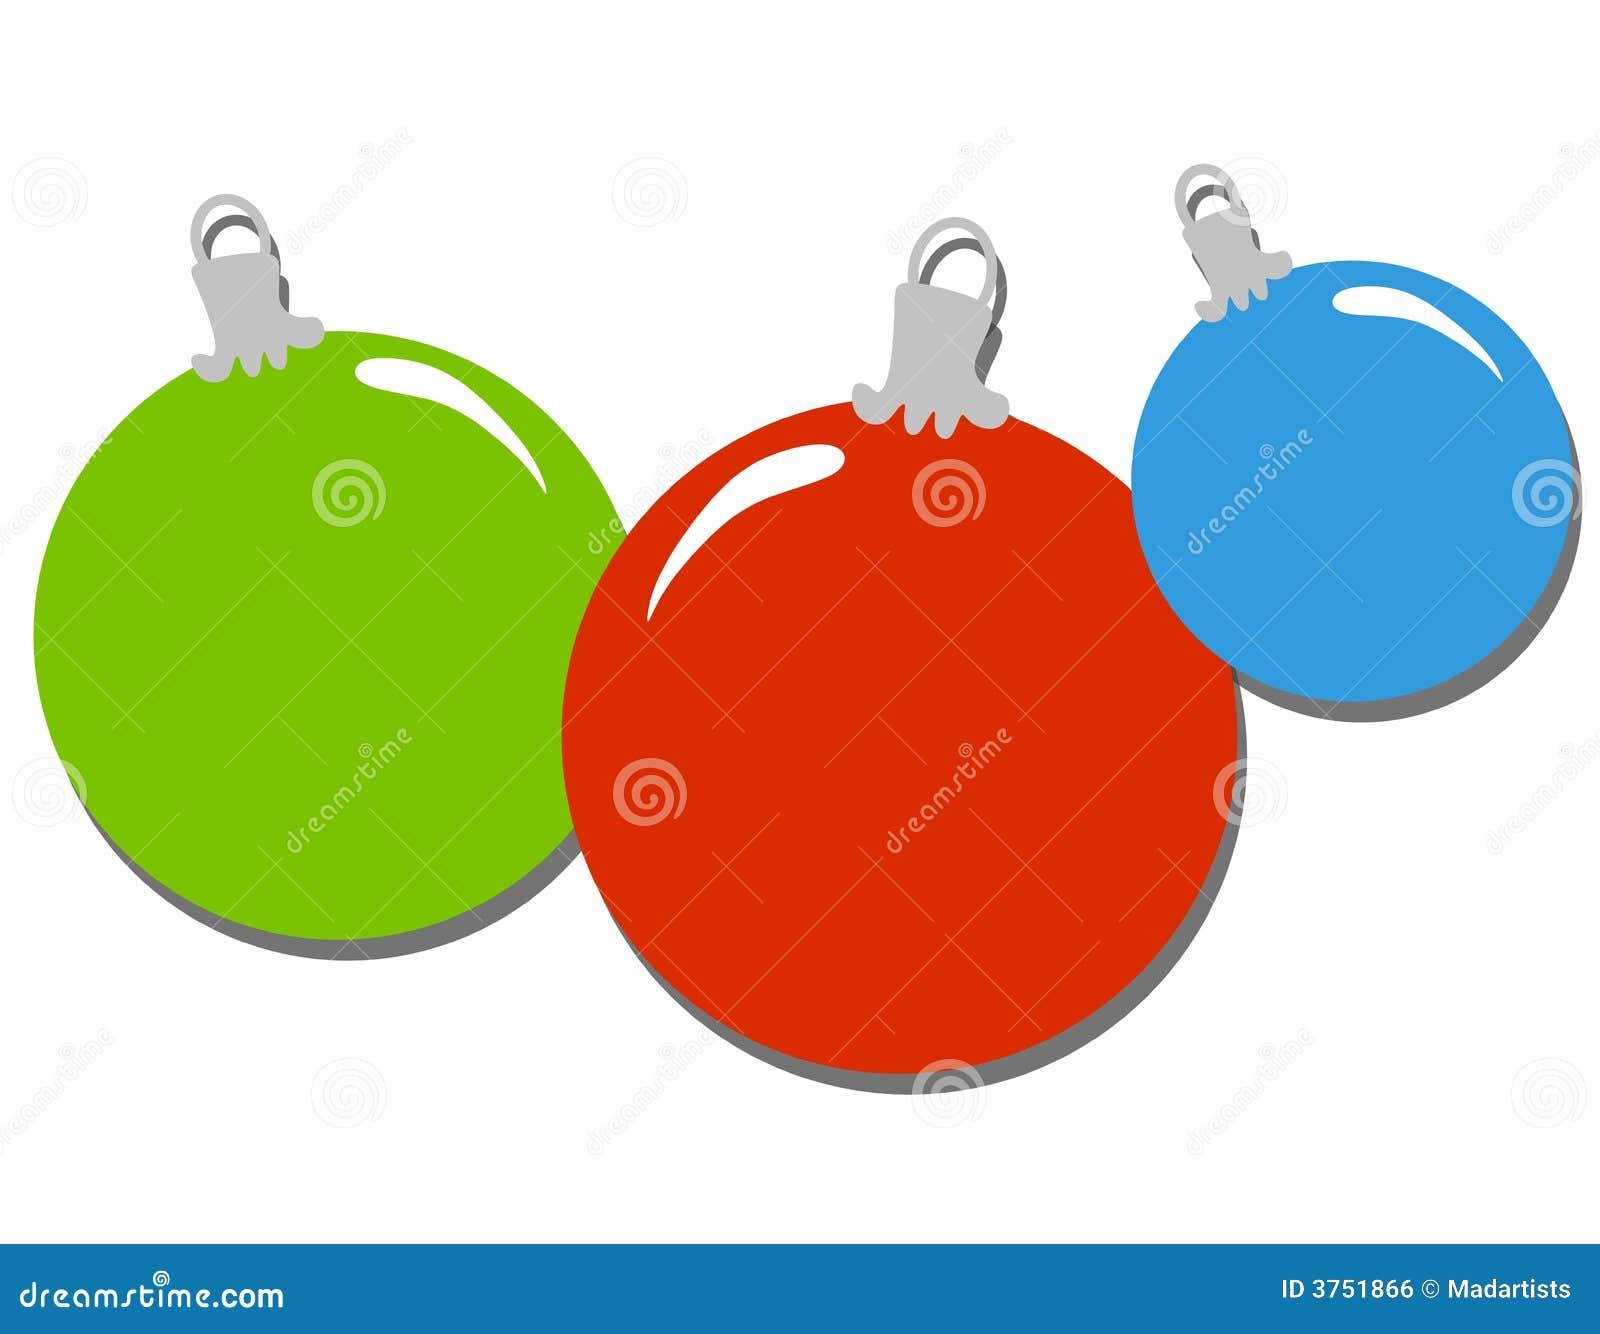 Simple Christmas Ornaments Clip Art Stock Illustration ...